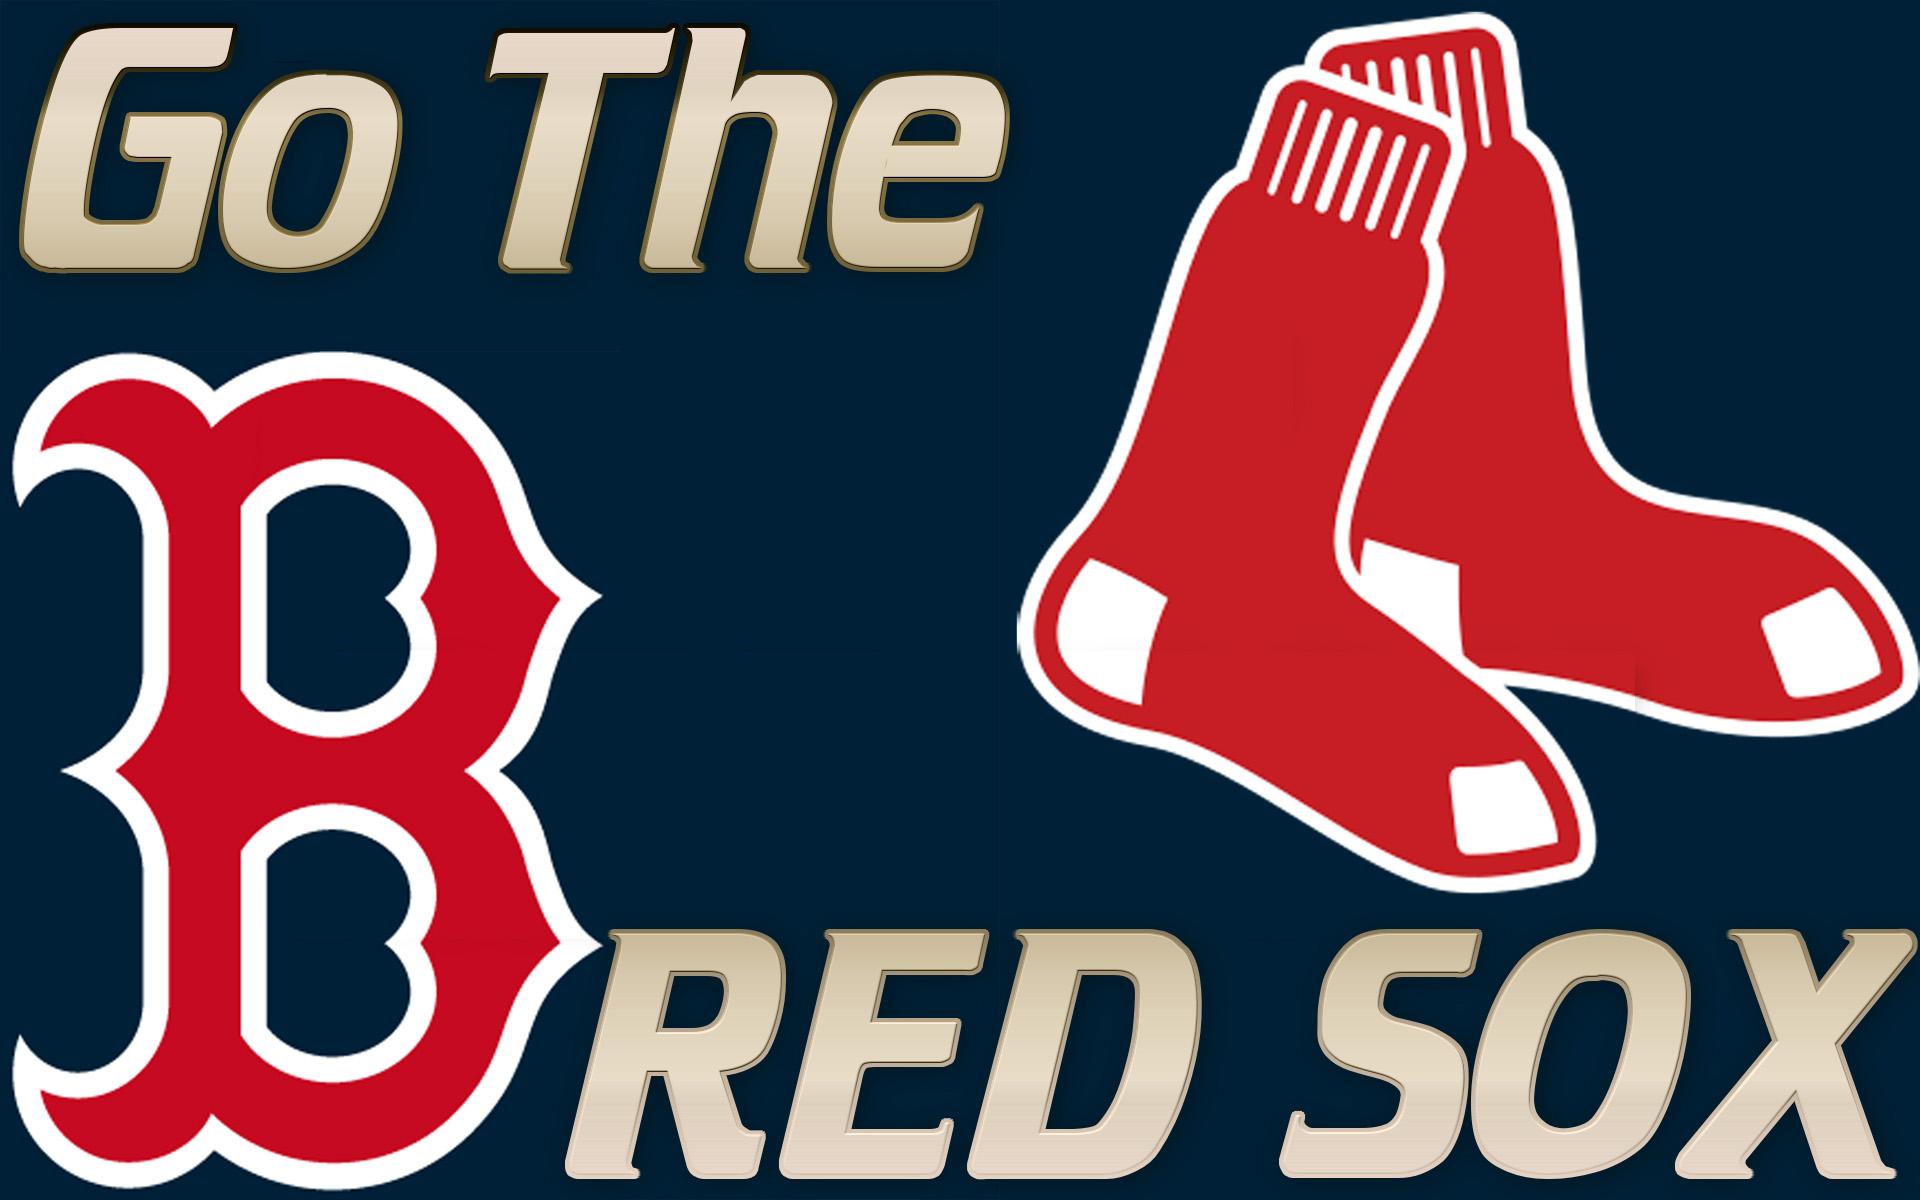 BOSTON RED SOX baseball mlb gs wallpaper 1920x1200 158188 1920x1200